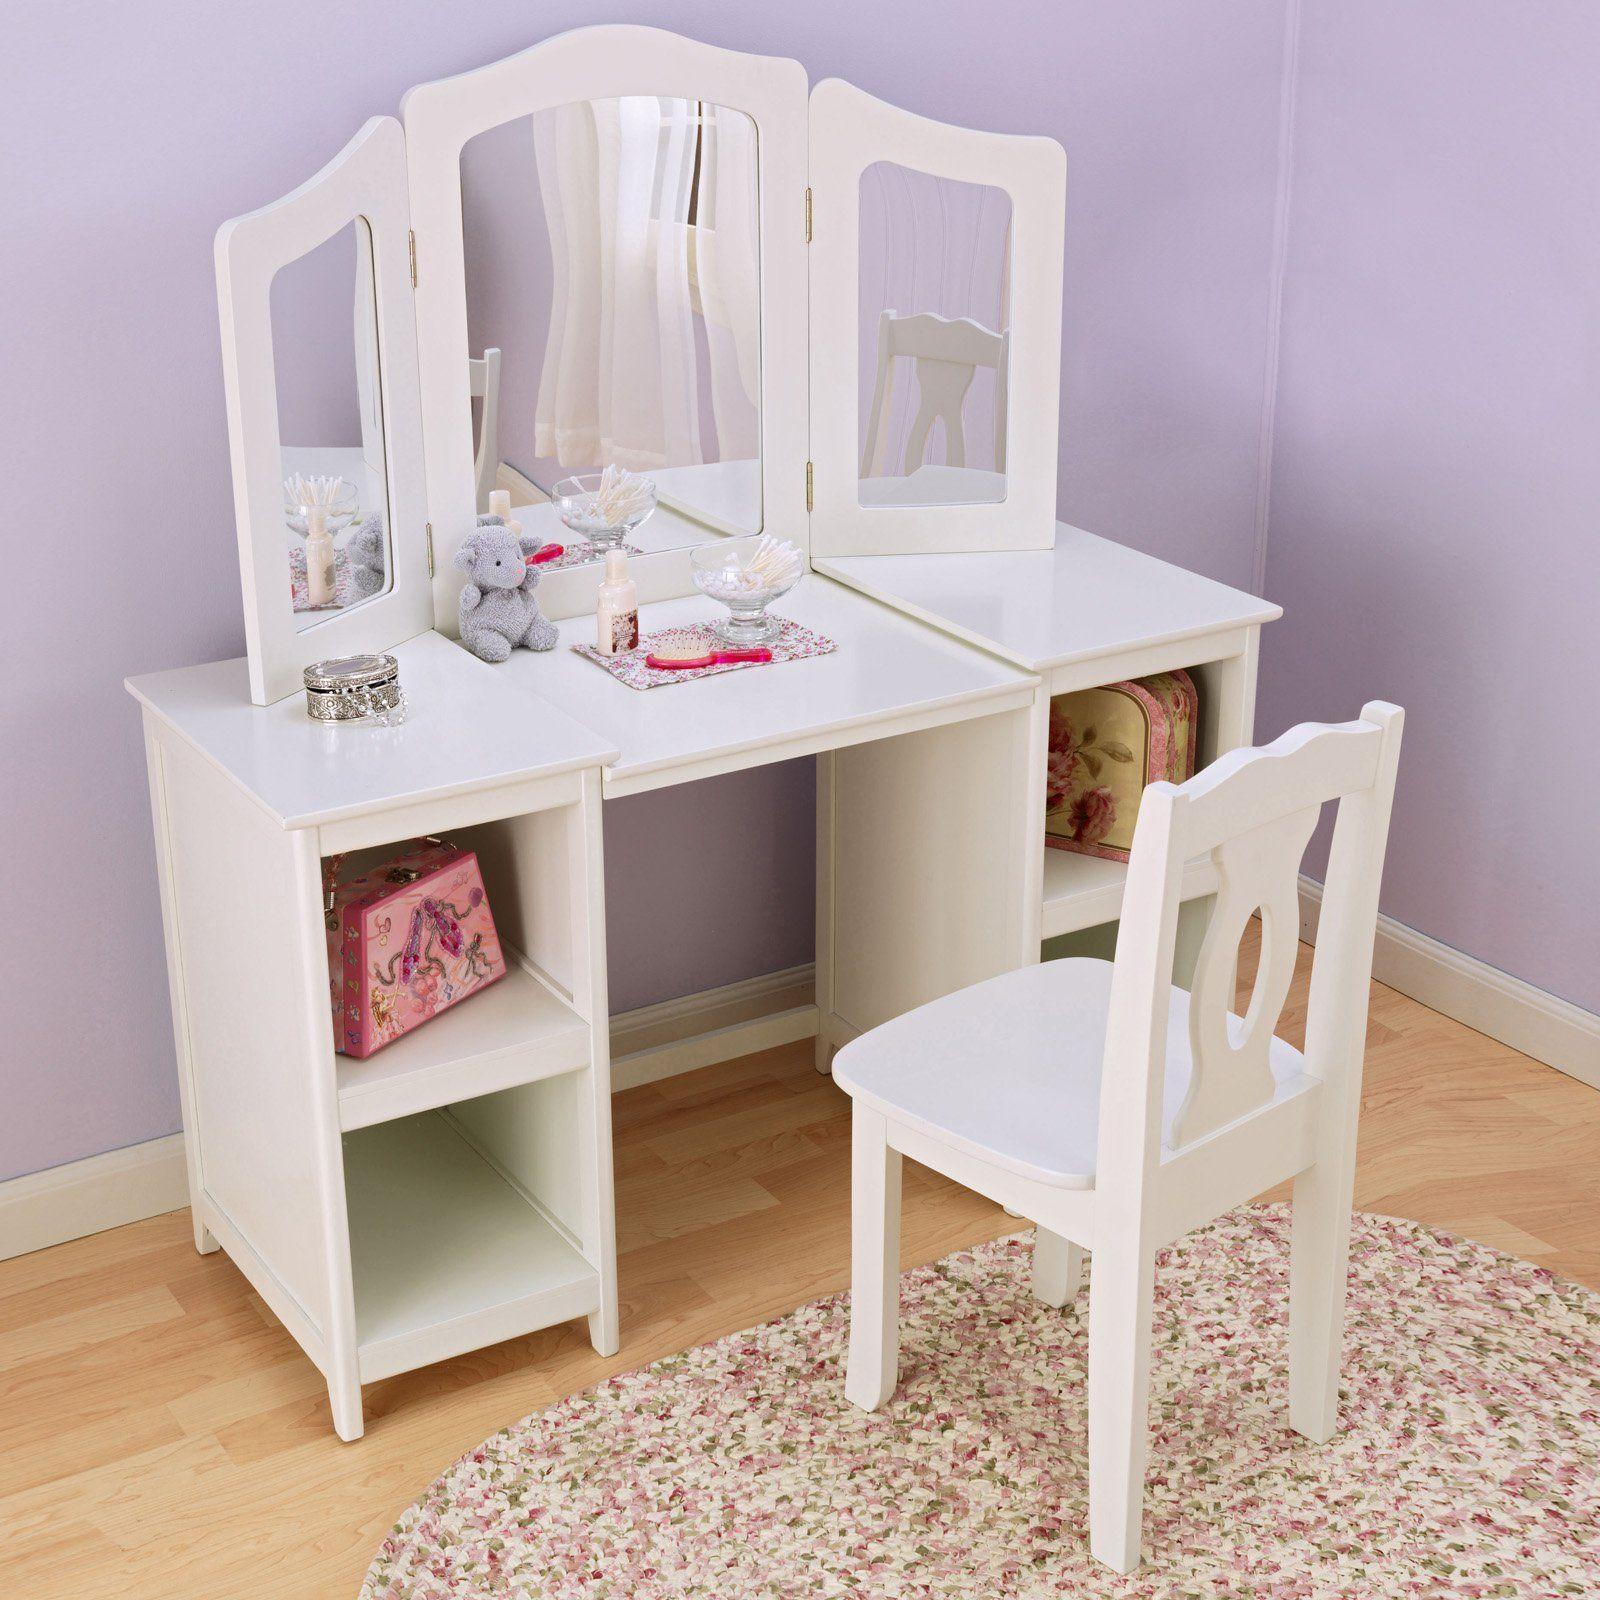 KidKraft Deluxe Vanity & Chair - 13018 - Perfect For Any Girl's Room, The  KidKraft